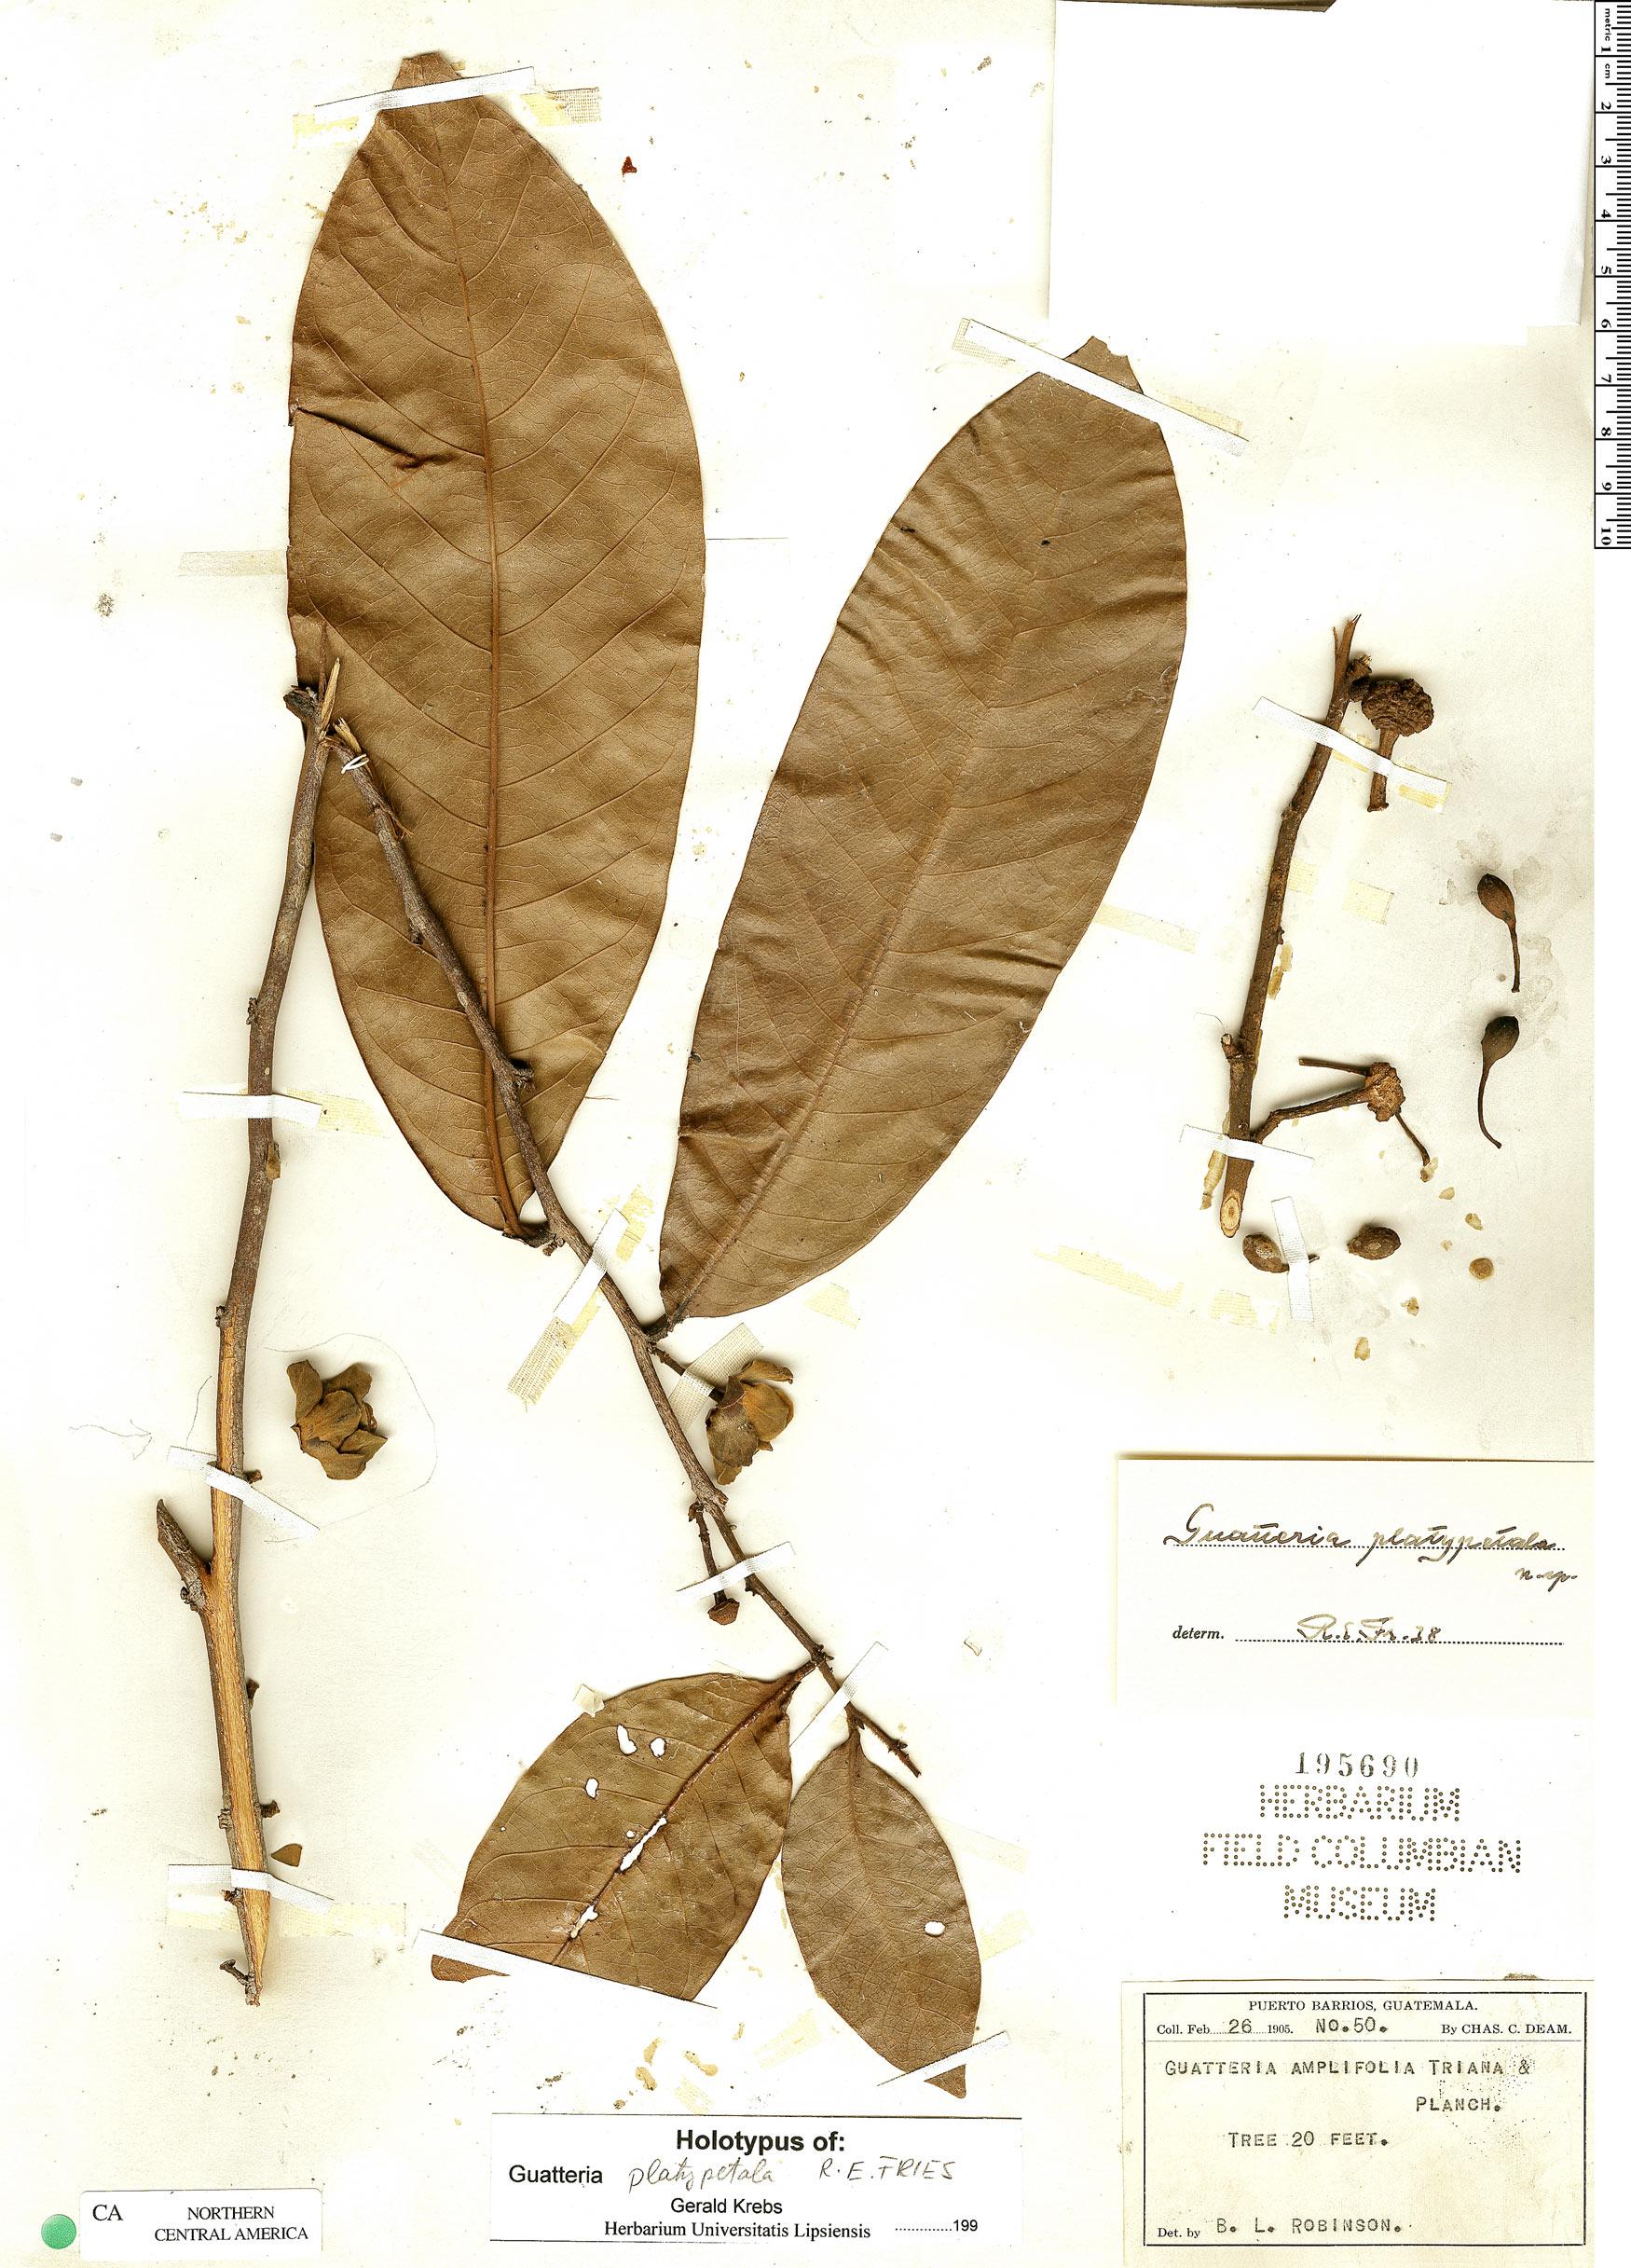 Specimen: Guatteria amplifolia